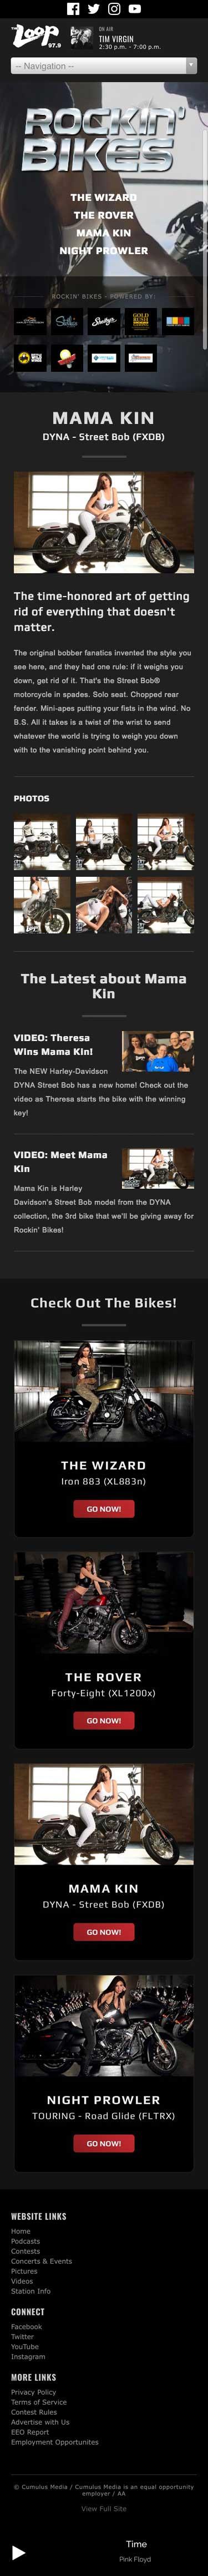 Rockin' Bikes - Mama Kin Page - iPhone View